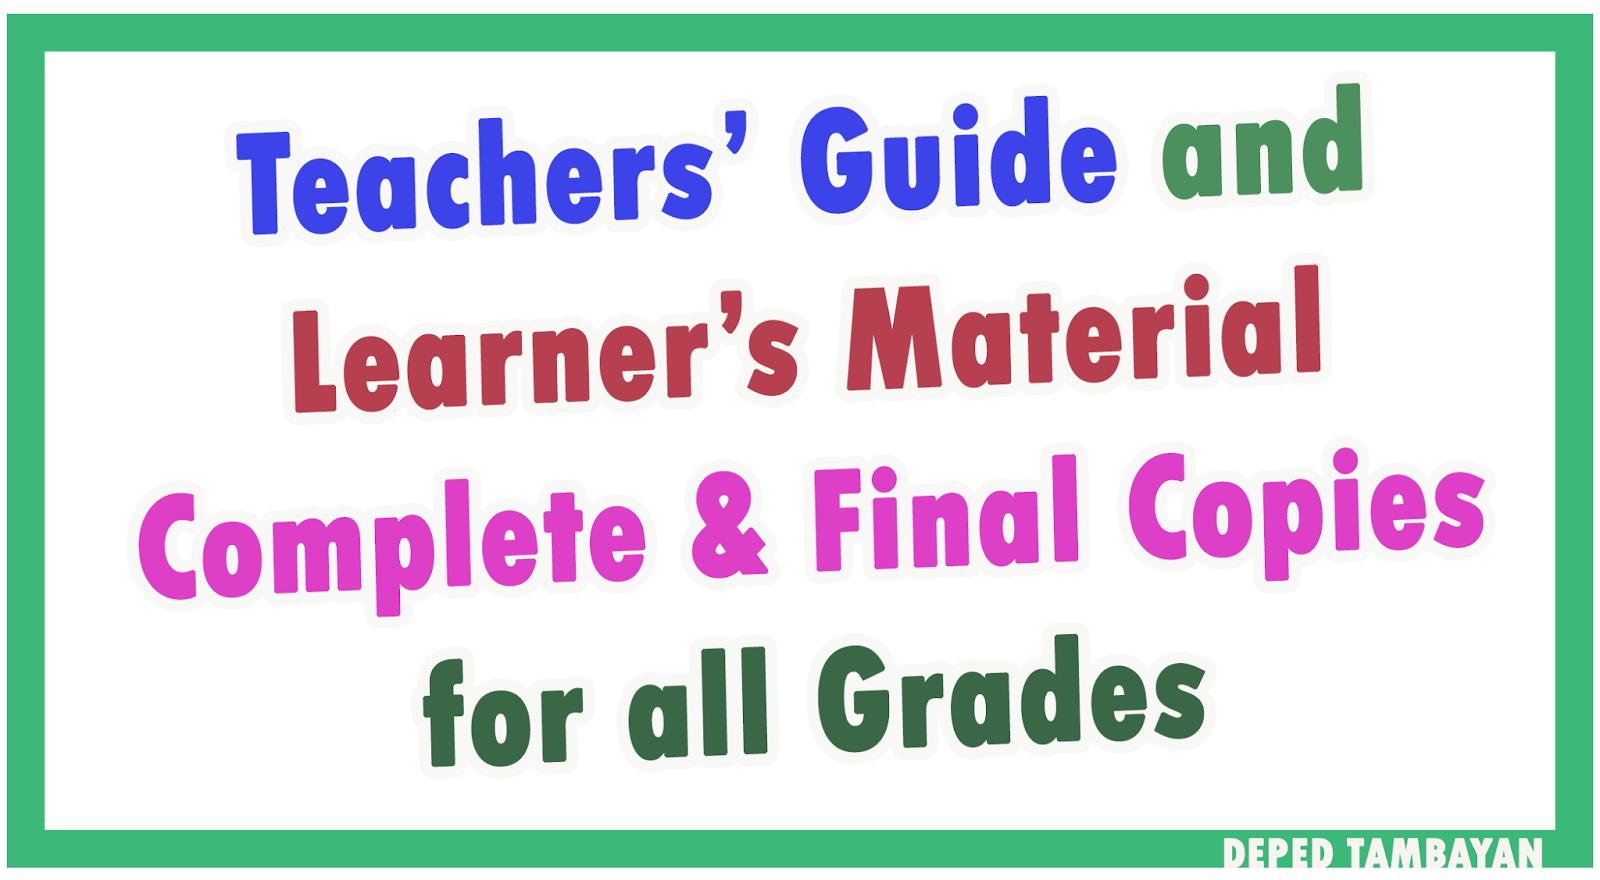 Download Complete Set Of Tg Amp Lm For All Grades Download